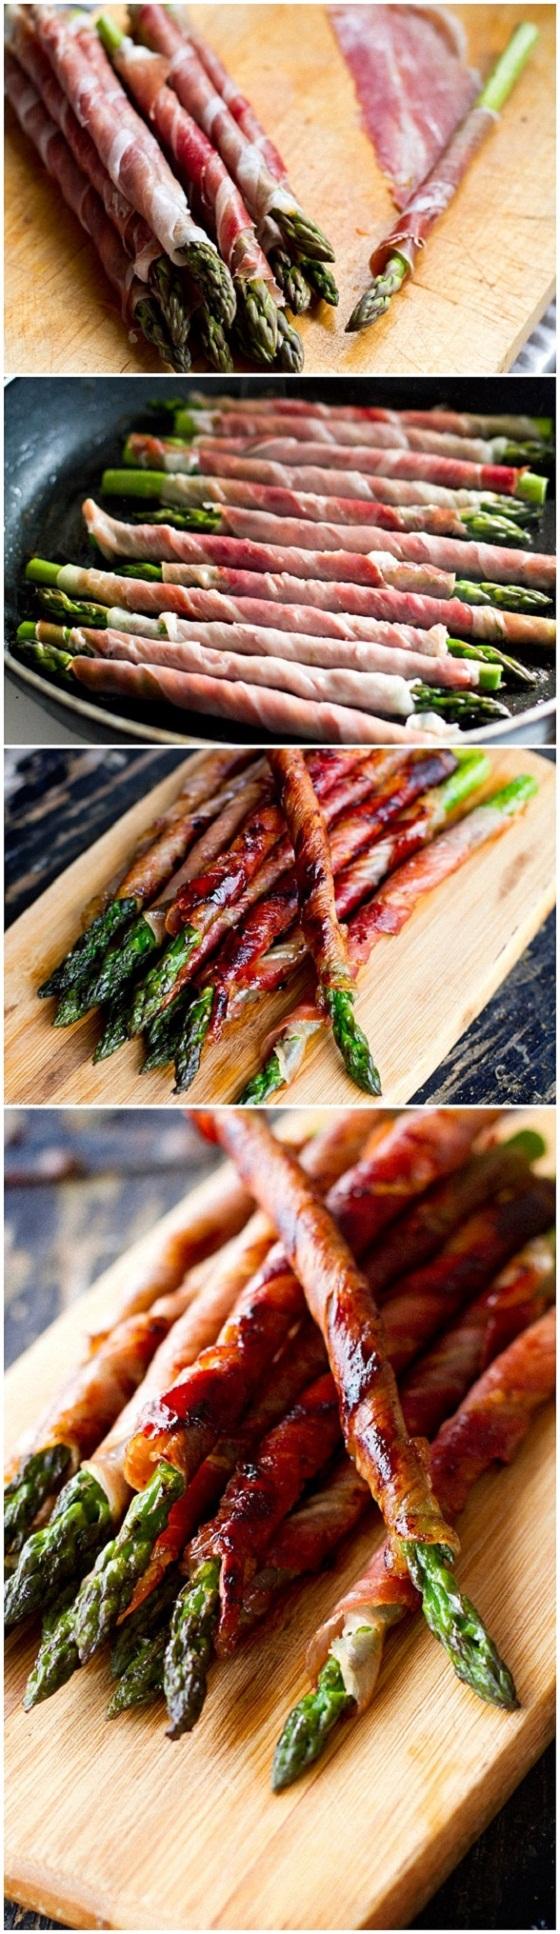 Prosciutto wrapped asparagus | 25+ NYE party ideas